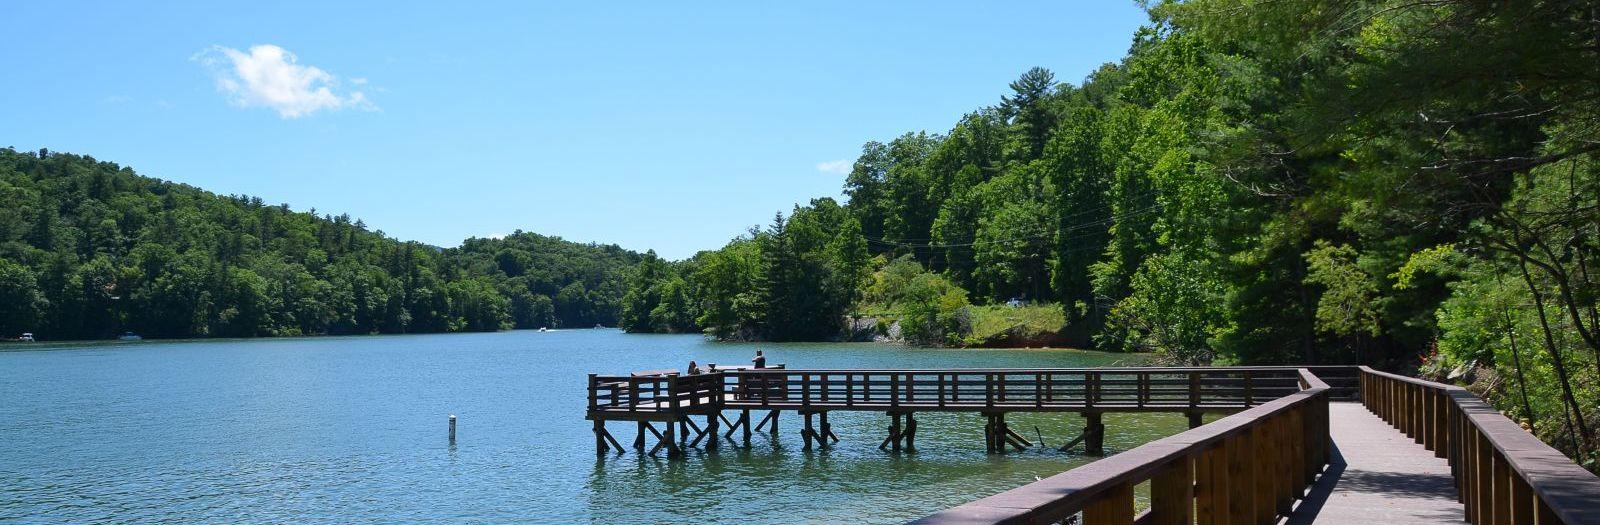 Photo of Lake Glenville